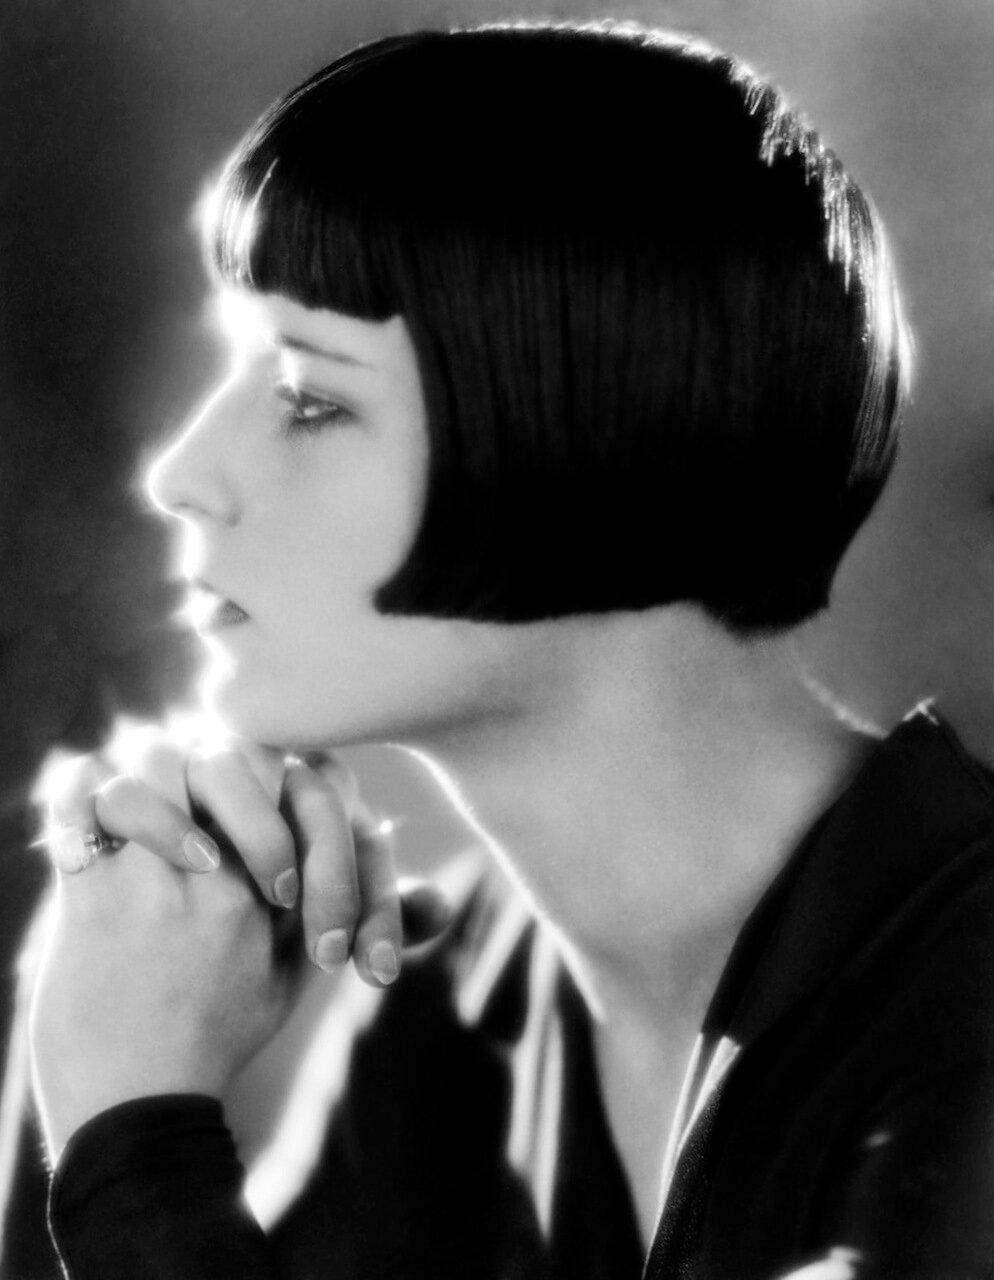 c. 1925: Louise Brooks